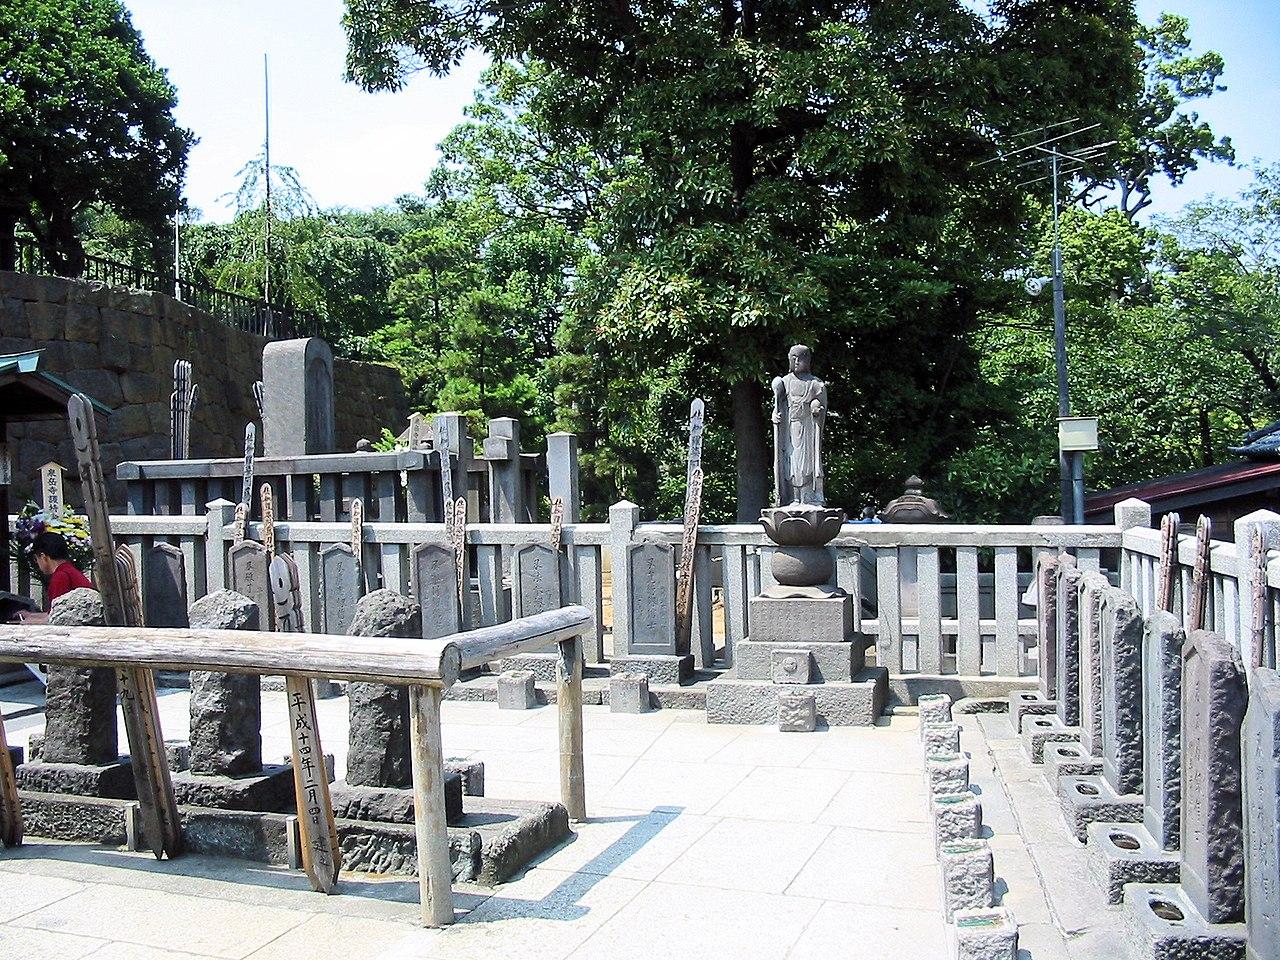 http://upload.wikimedia.org/wikipedia/commons/thumb/5/5c/Sengakuji_47_ronin_graves.jpg/1280px-Sengakuji_47_ronin_graves.jpg